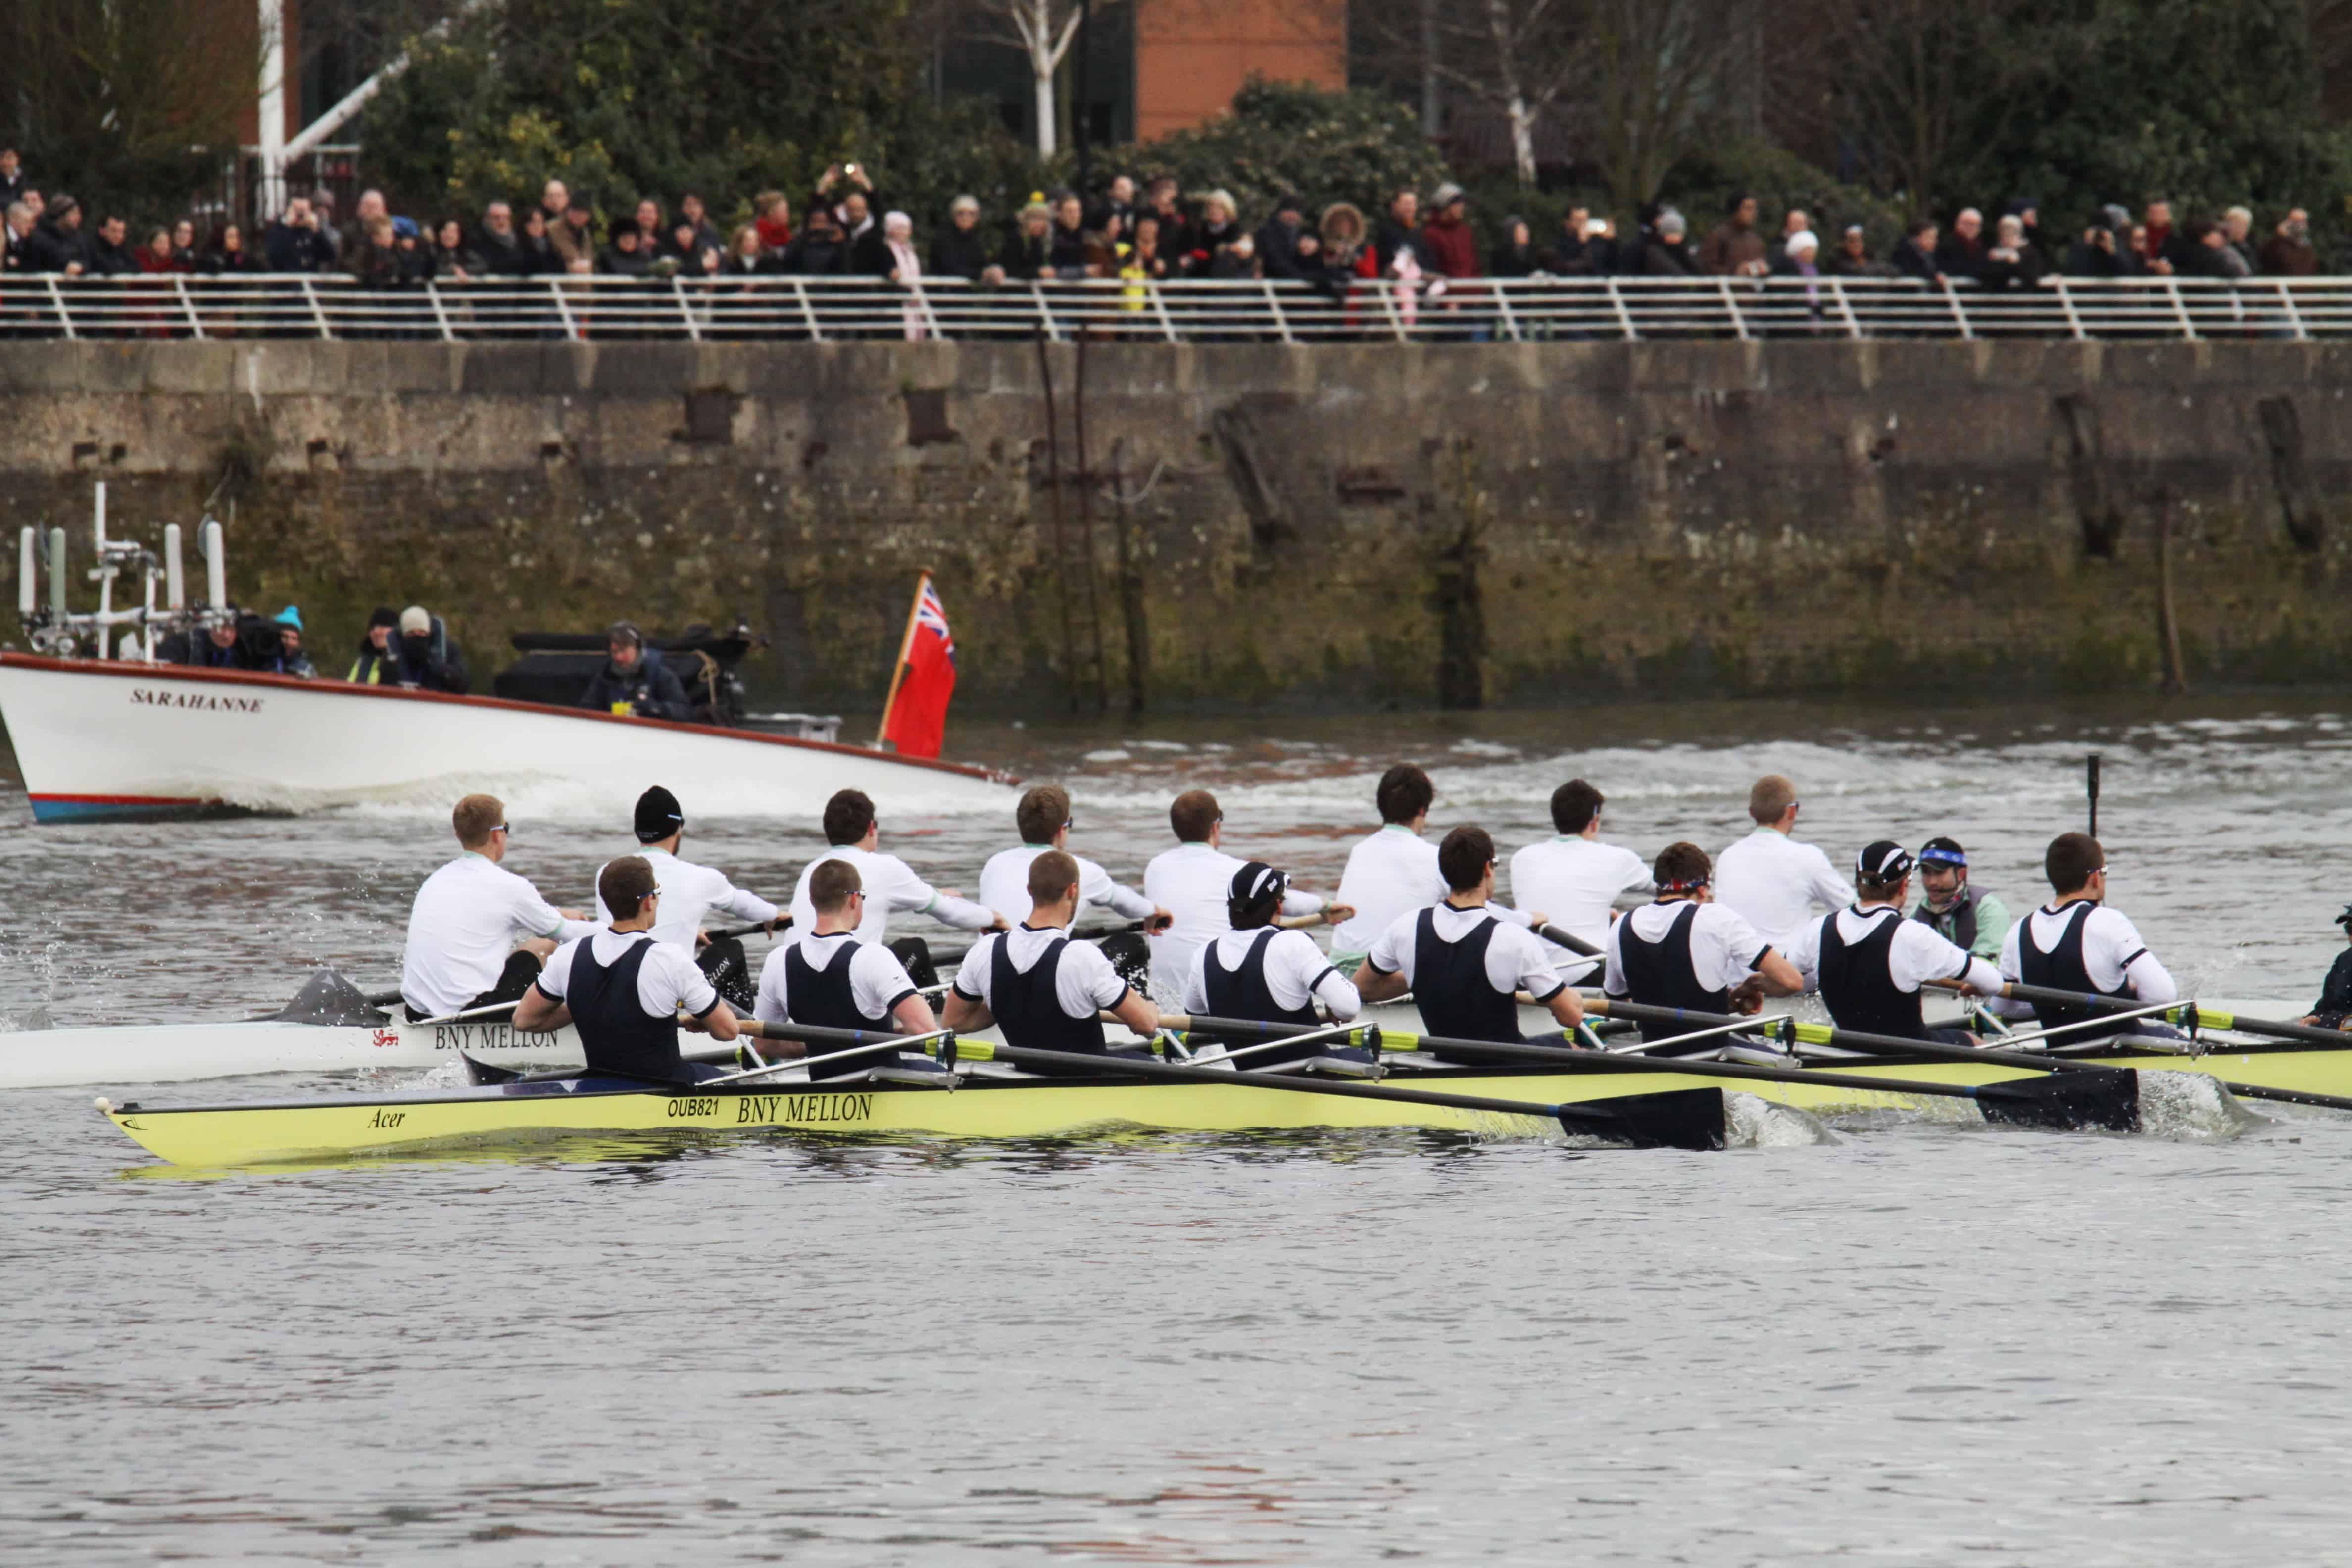 Boa Race Oxford